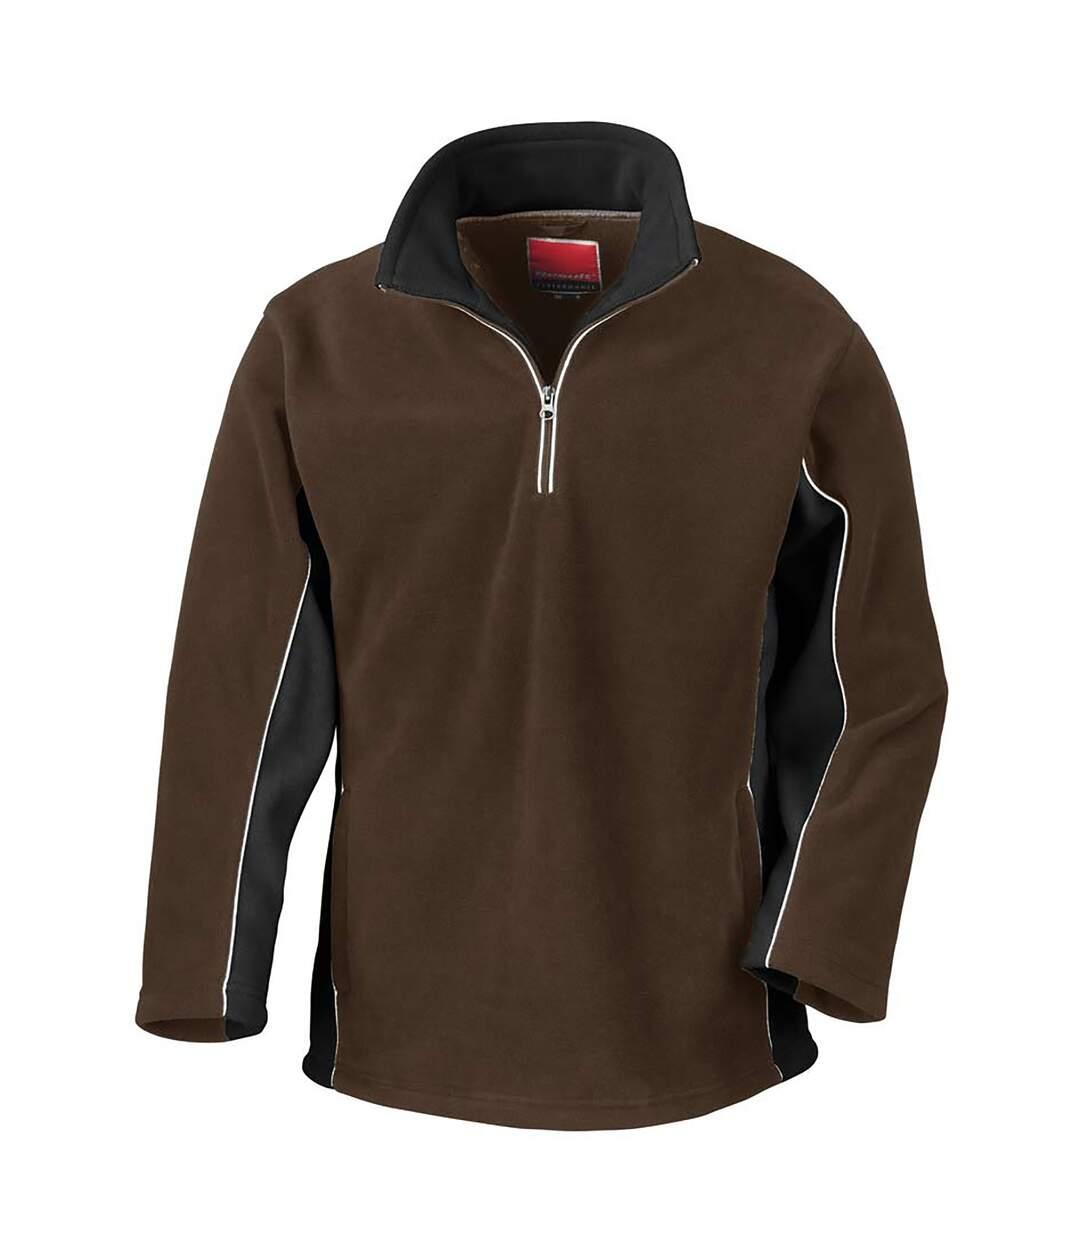 Result Mens Tech3 Sport Anti Pilling Windproof Breathable Fleece (Coffee/Black) - UTBC935